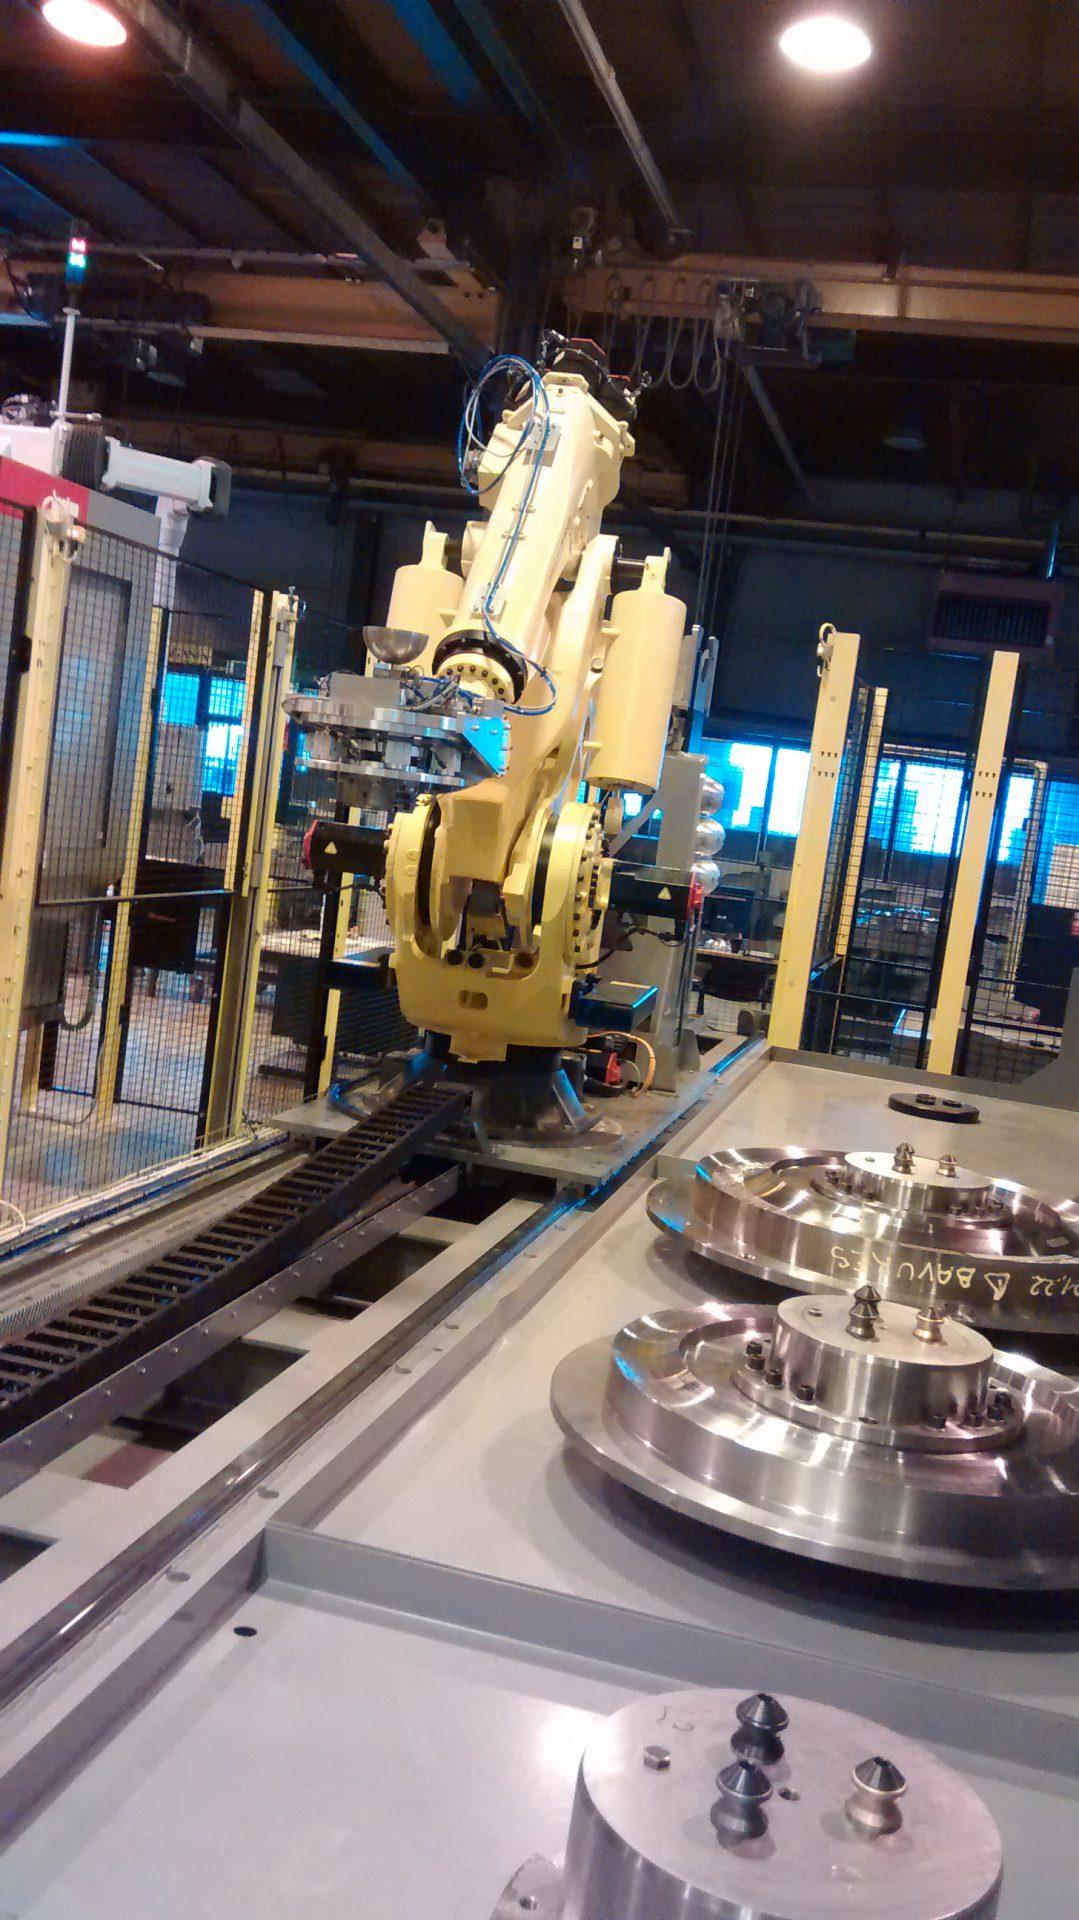 Verfahrachsen fur Roboter